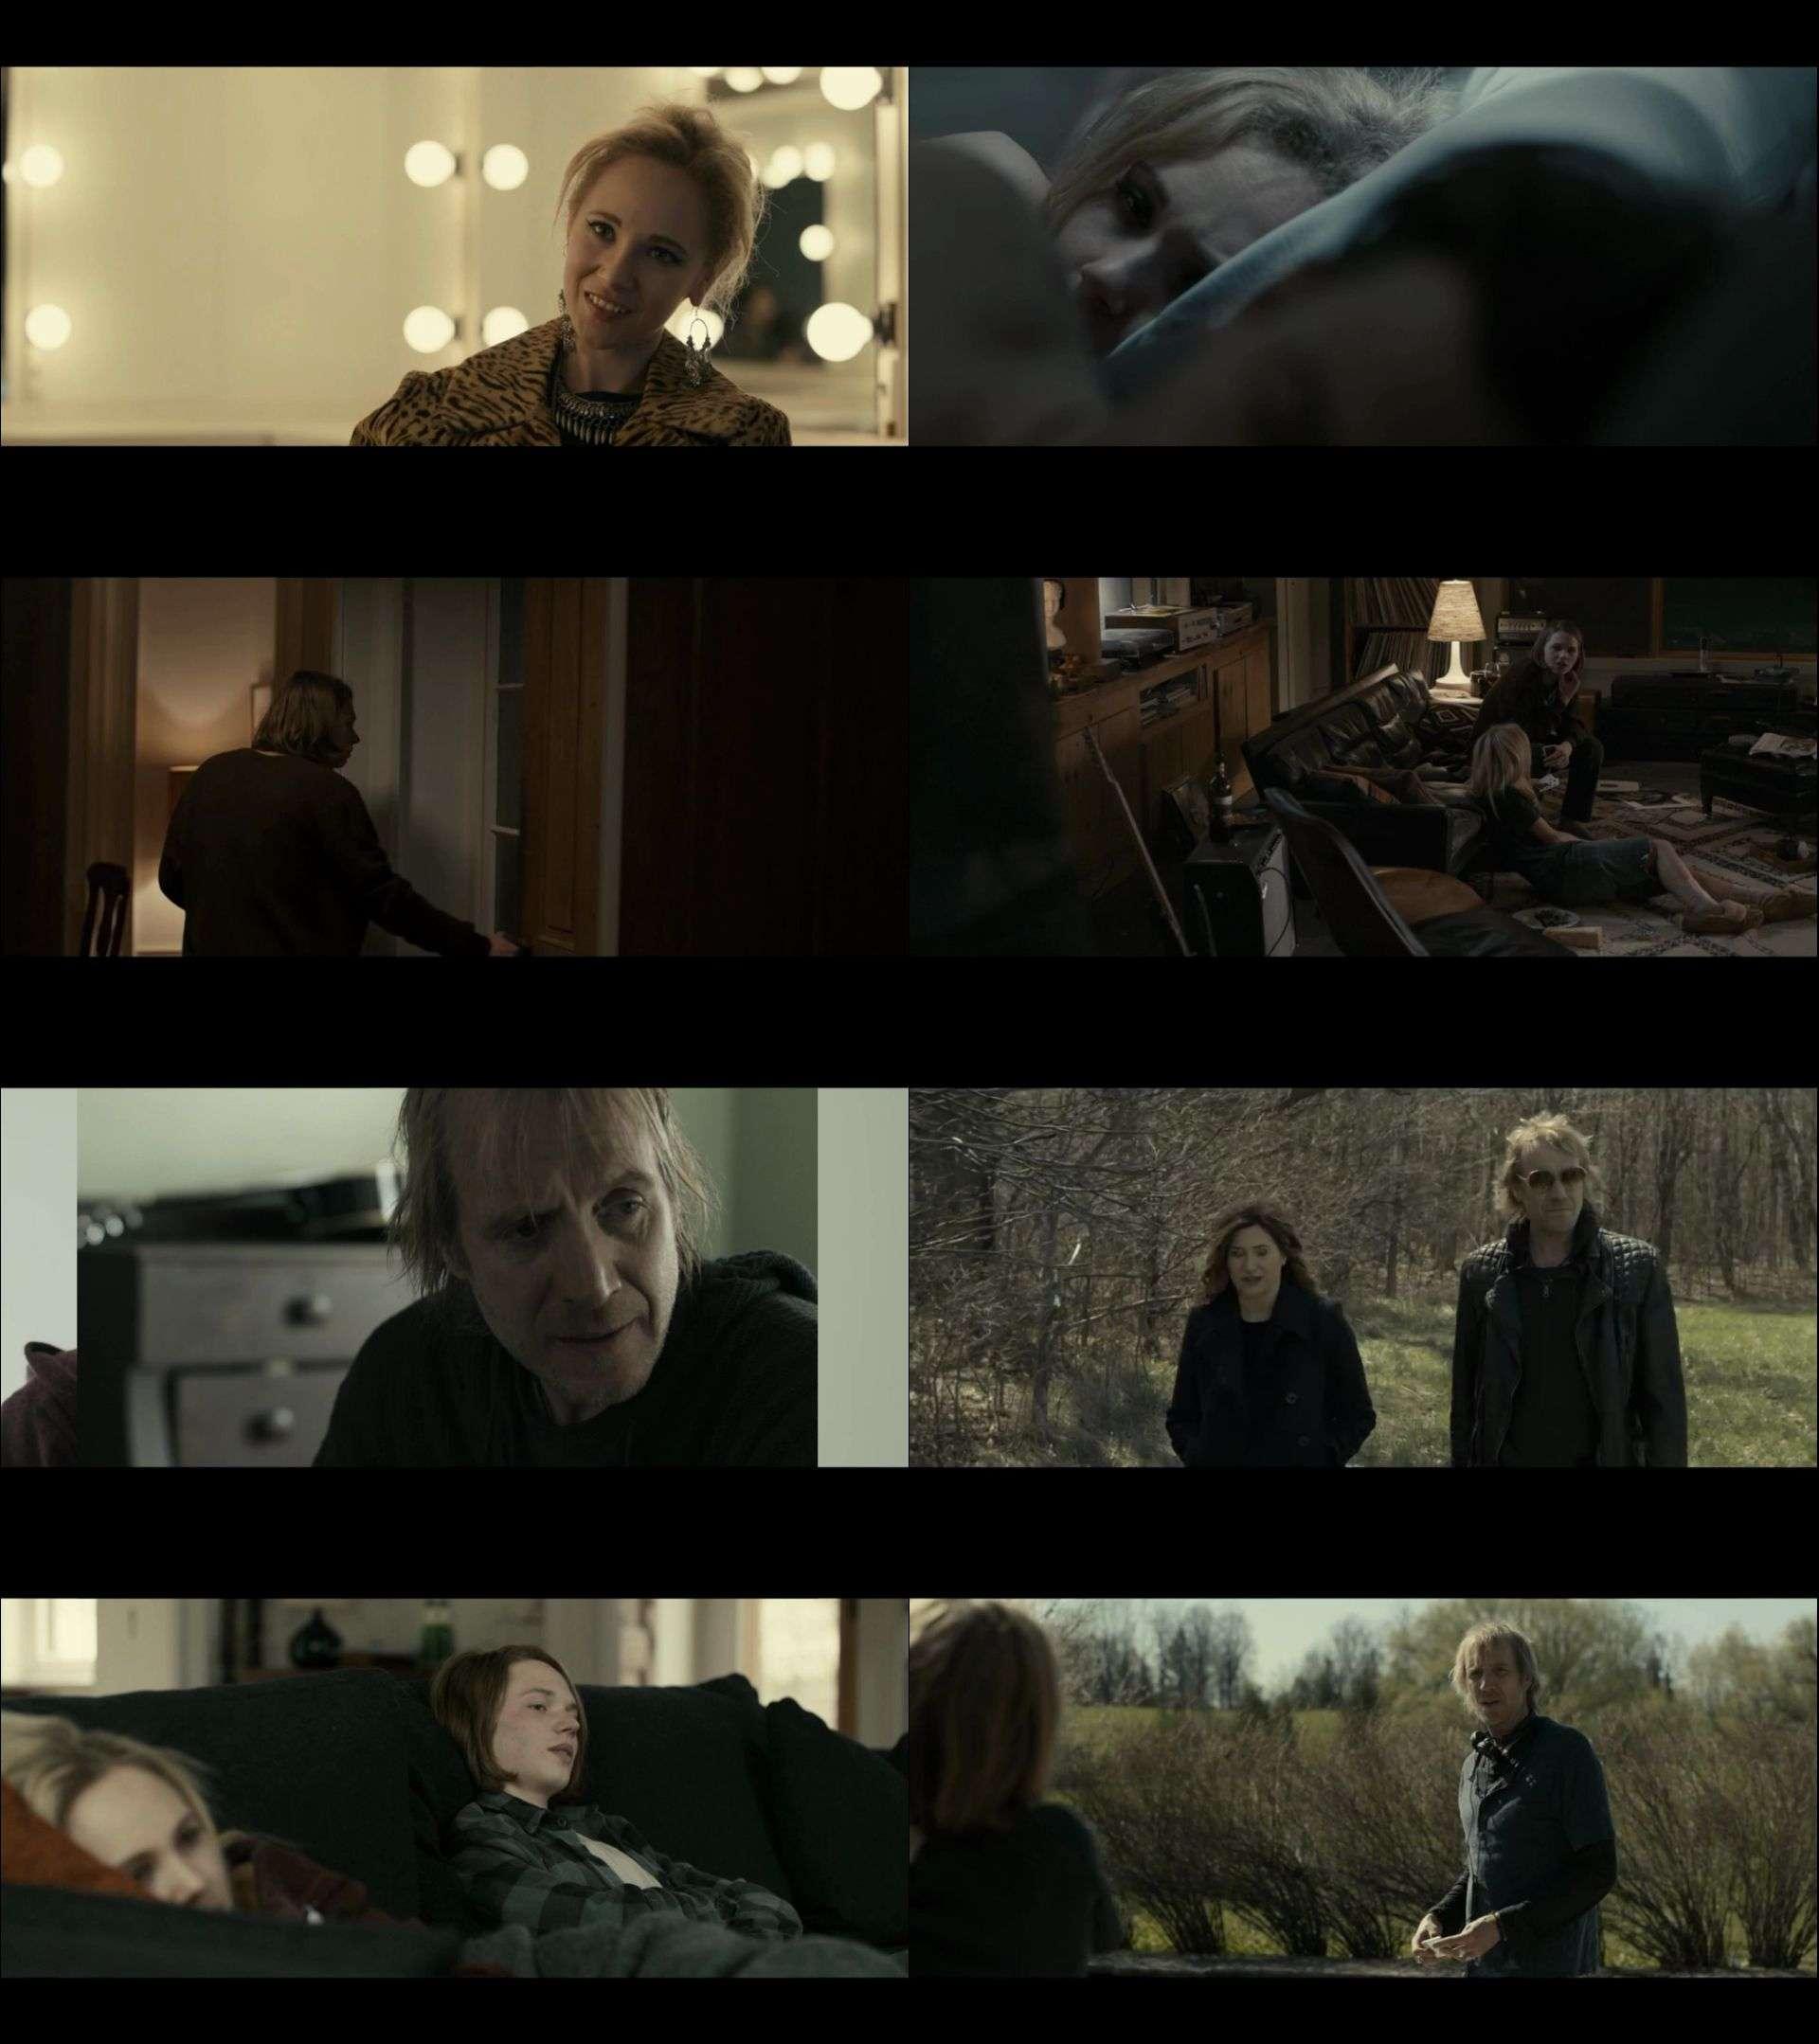 Len İnzivada - Len and Company (2015) türkçe dublaj full film indir